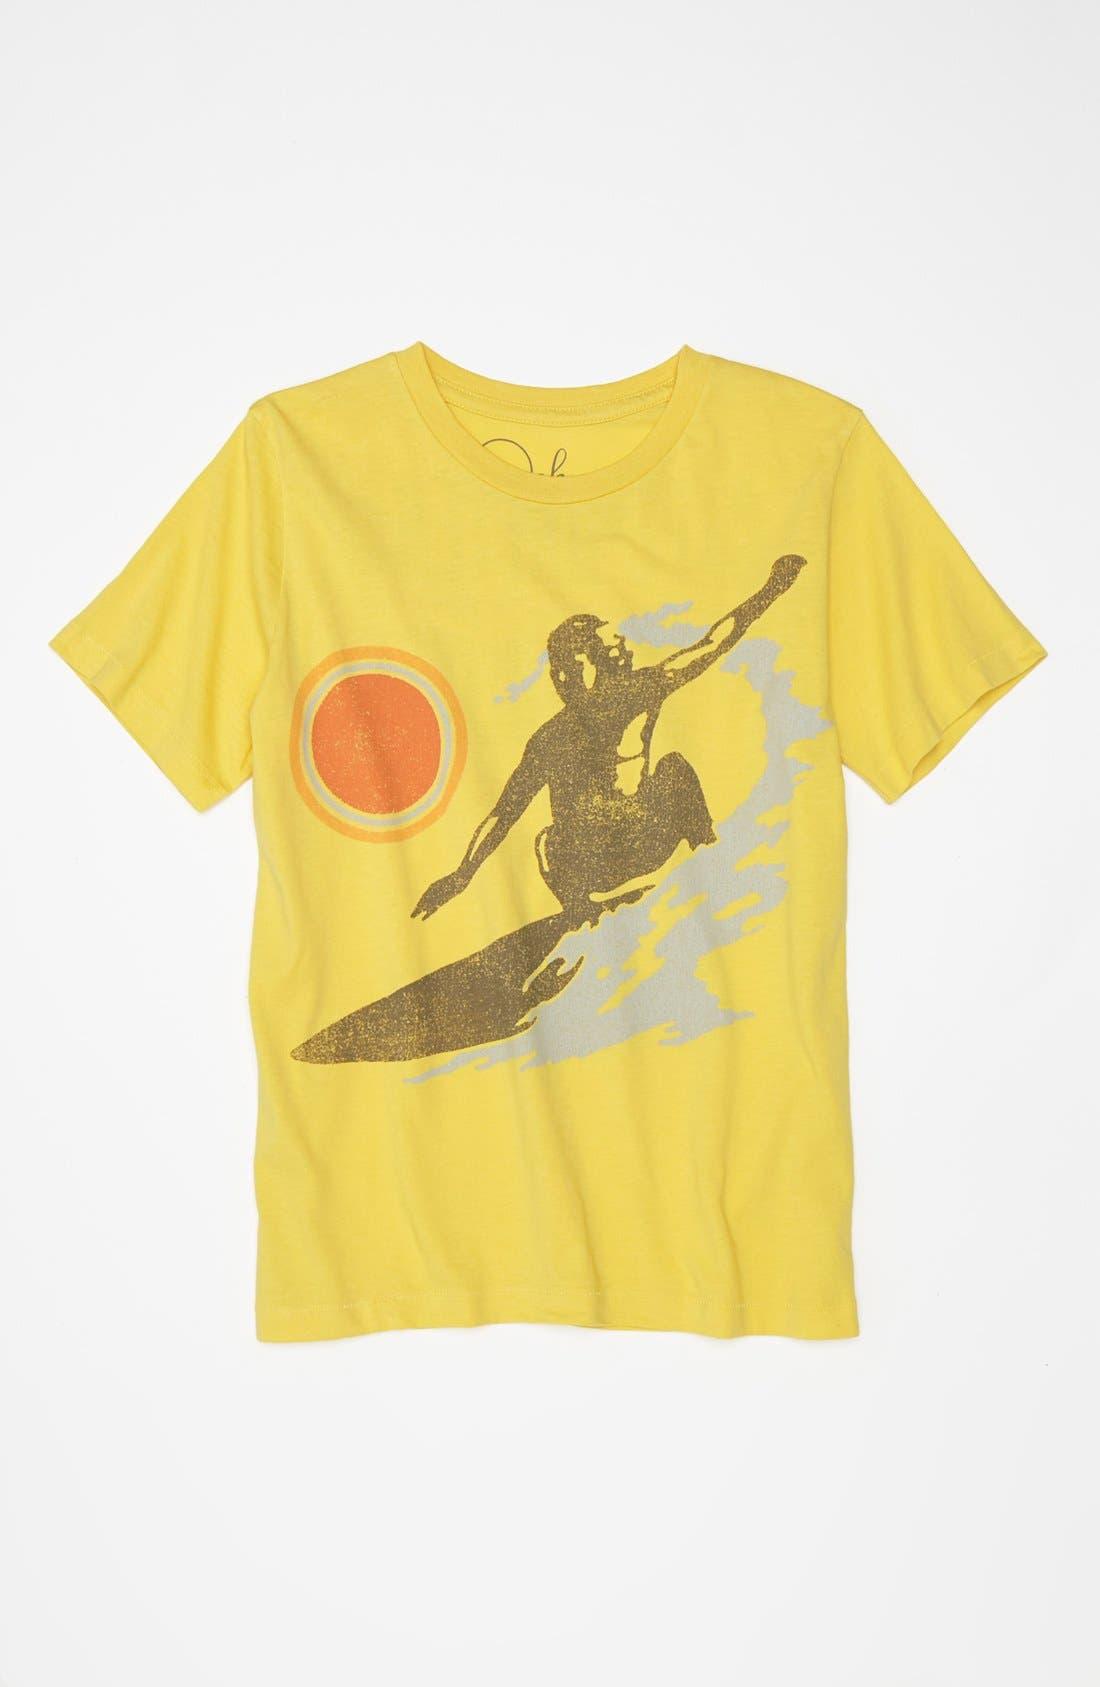 Main Image - Peek 'Cape Hatteras' T-Shirt (Toddler Boys, Little Boys & Big Boys)